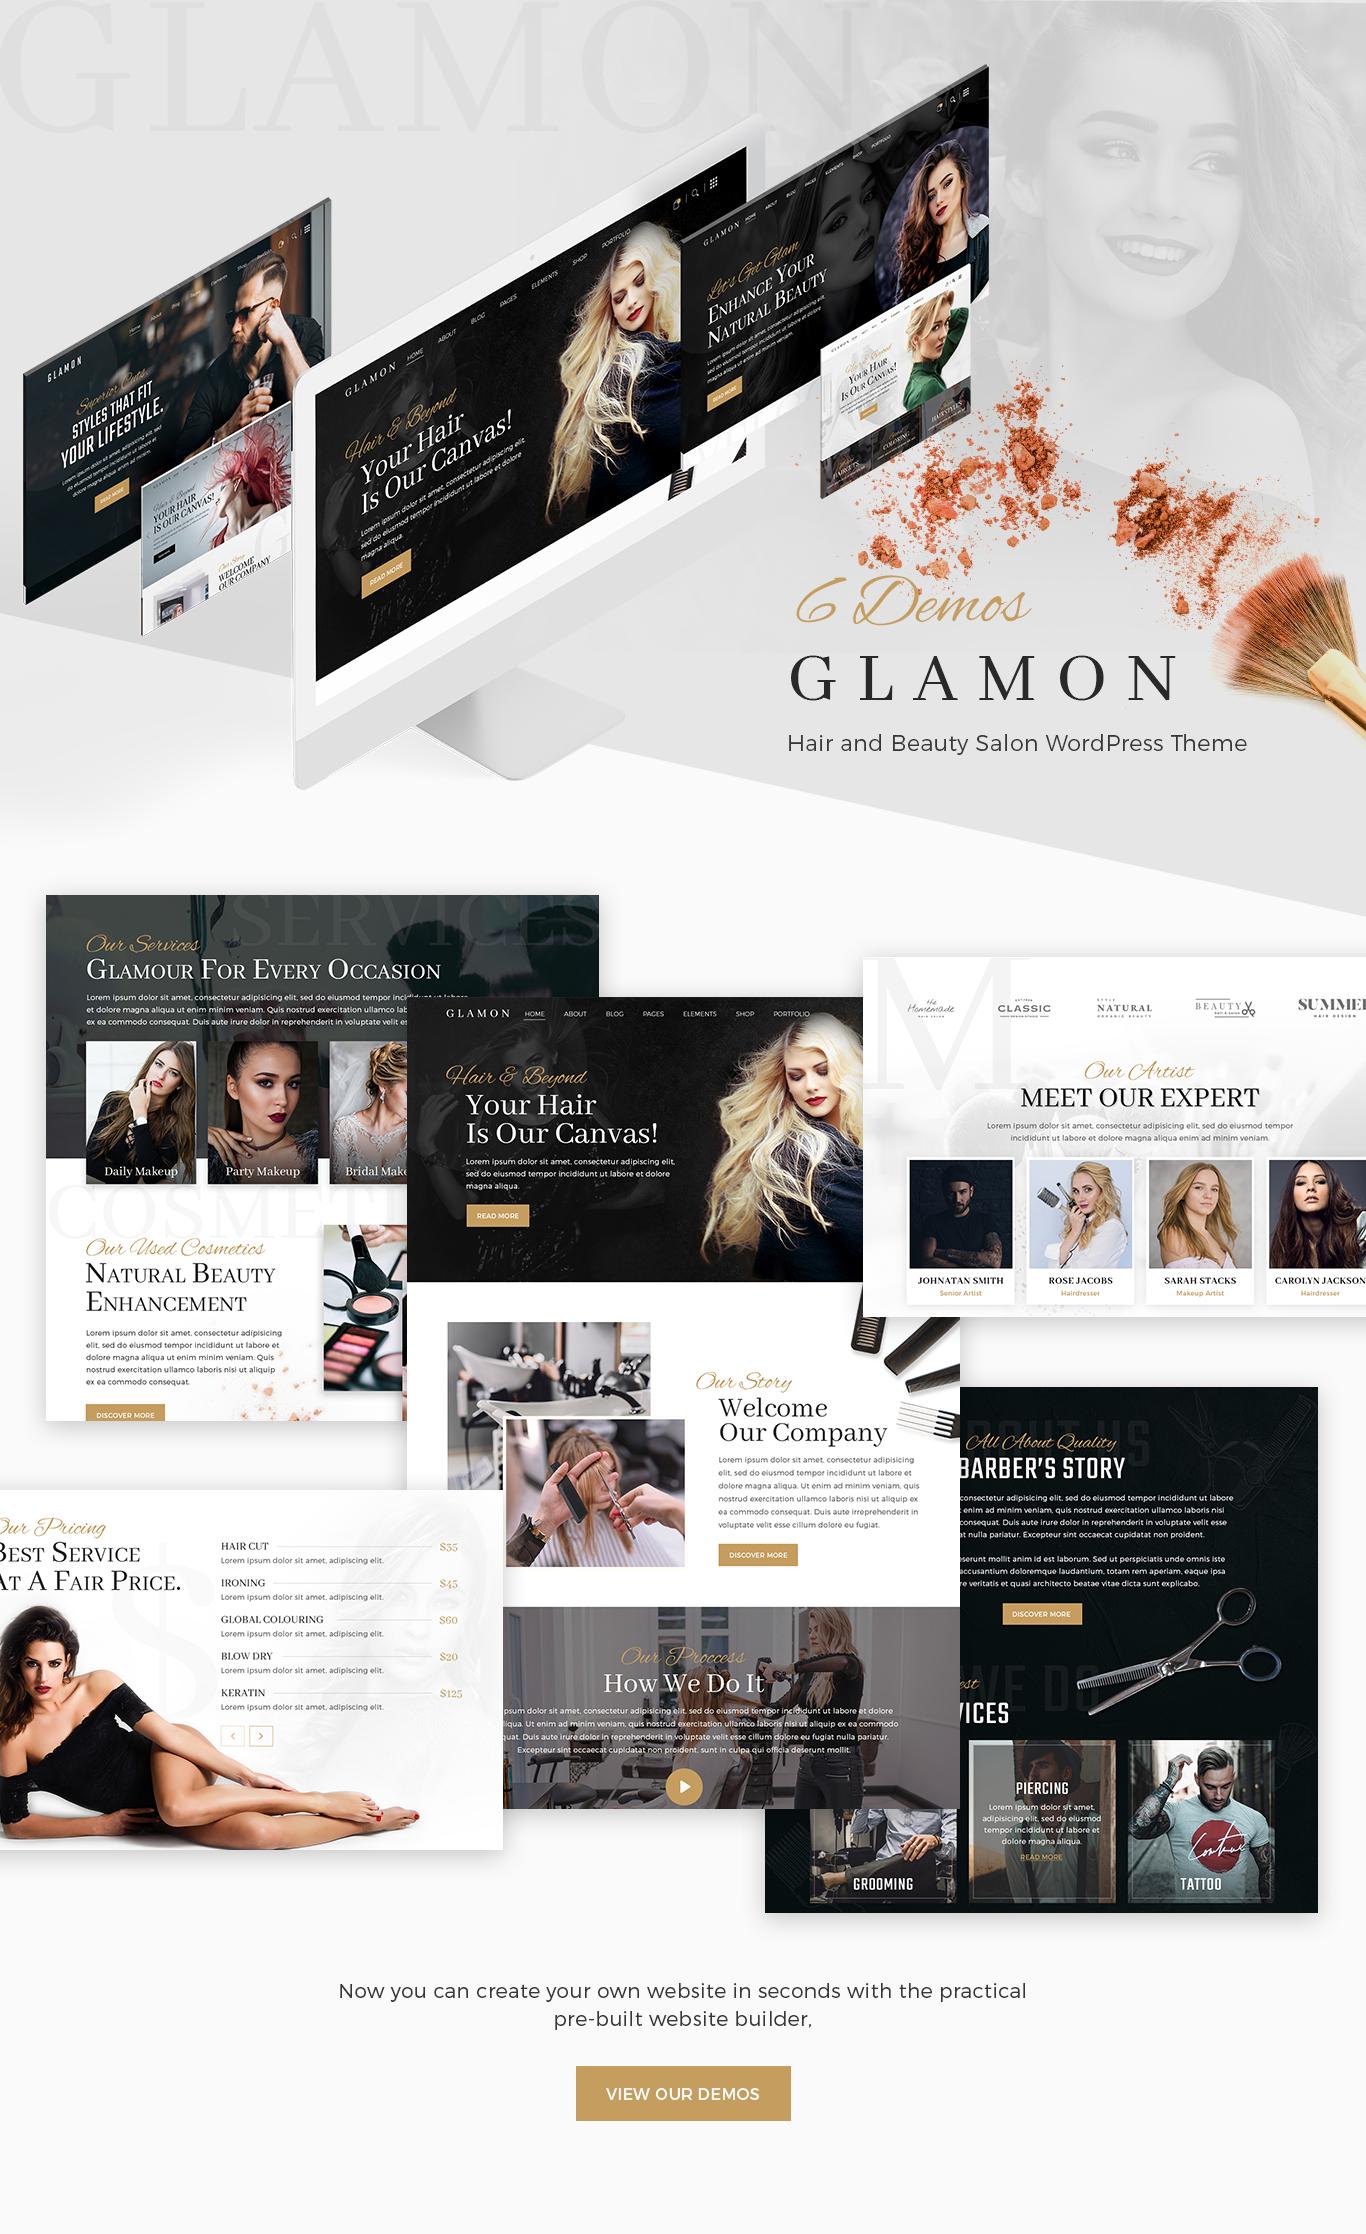 Glamon Presentation